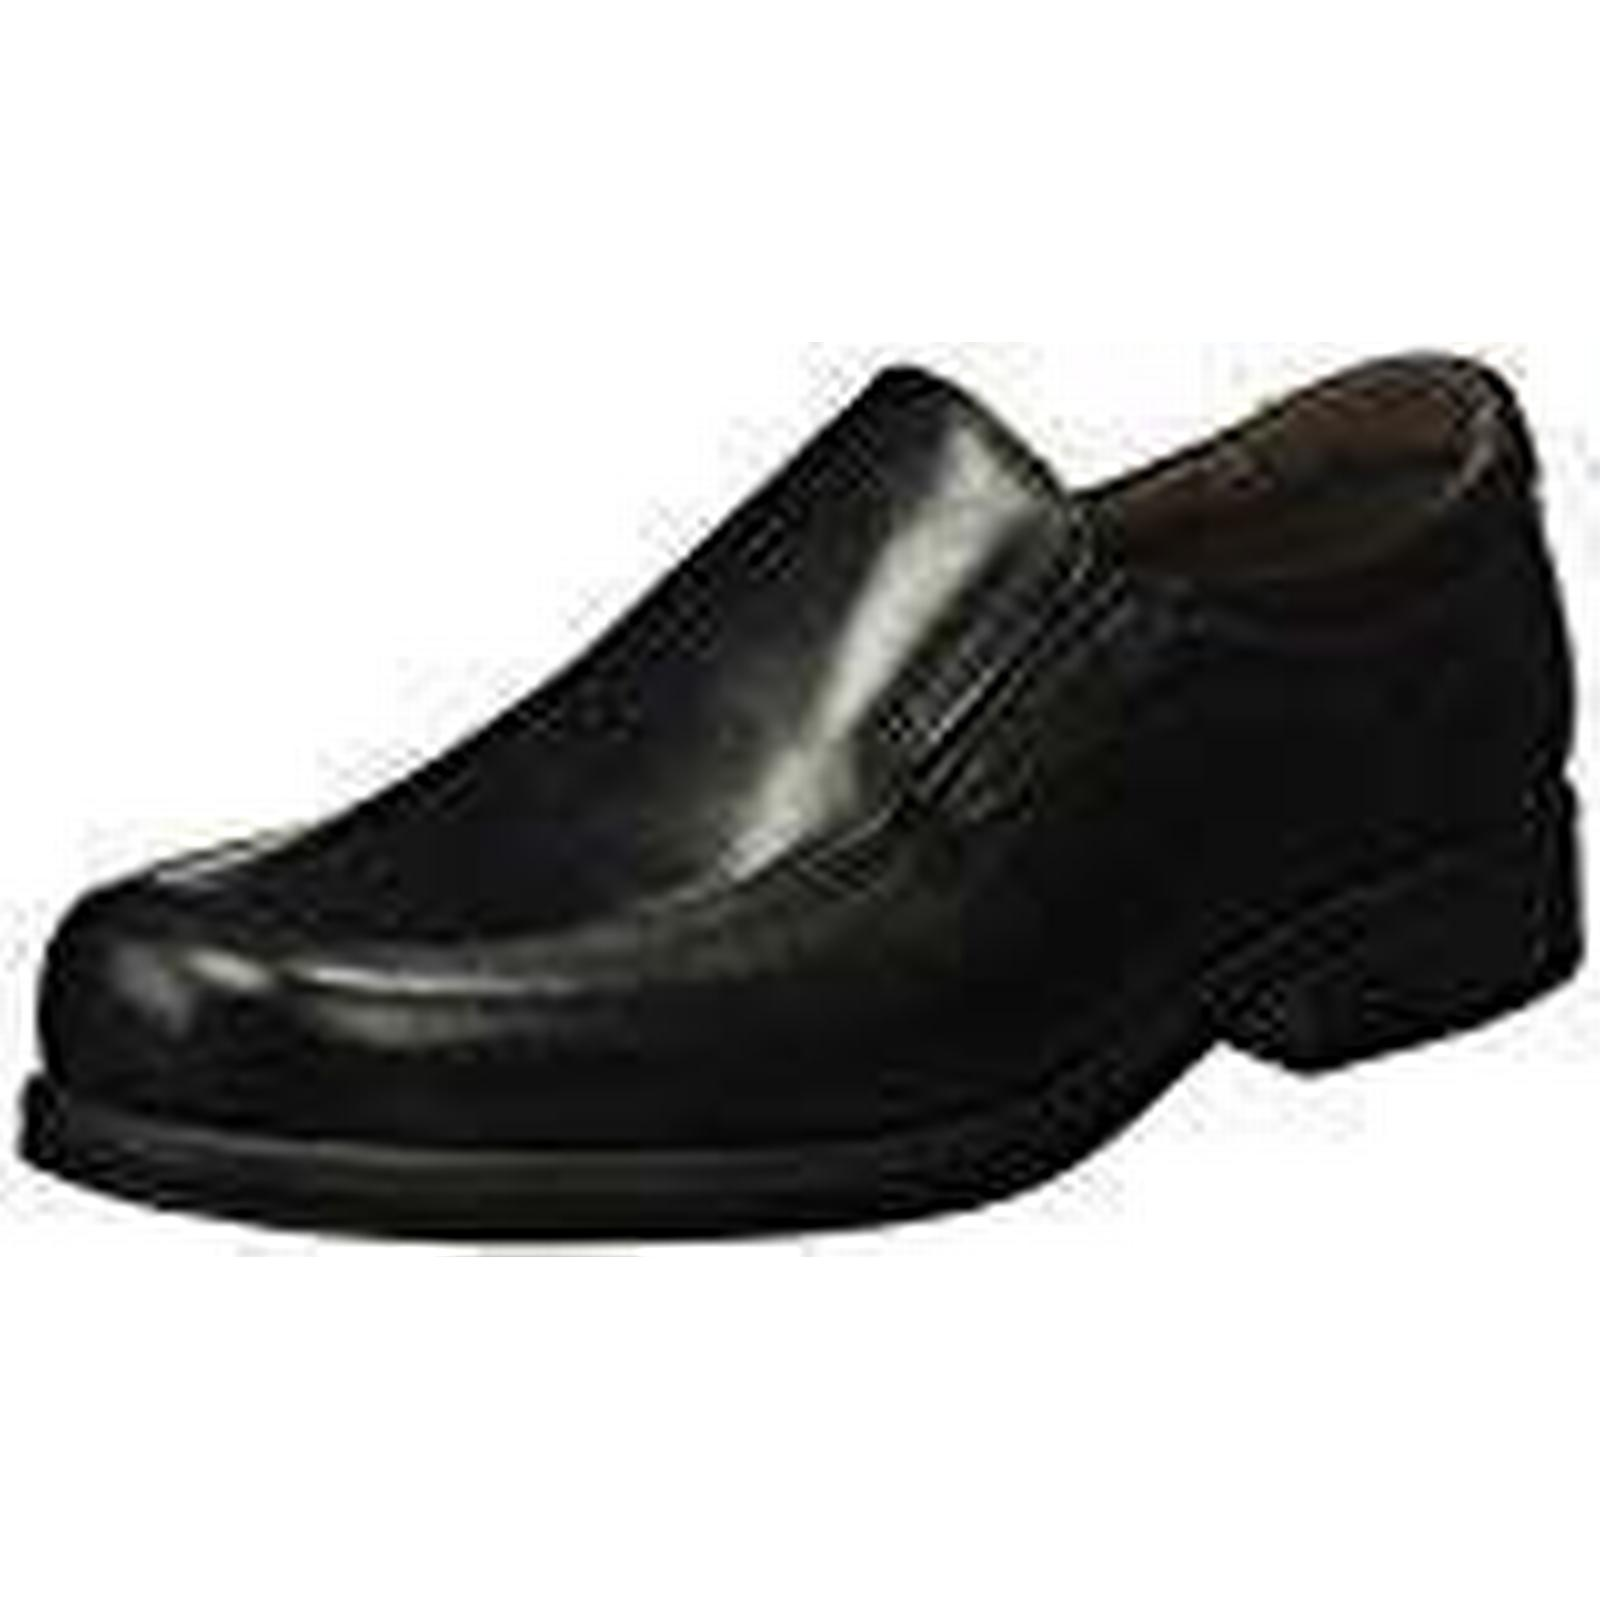 Tienda Calidad 8 Men's A7992 Trainers Black, 8 Calidad UK 8 UK c322cf